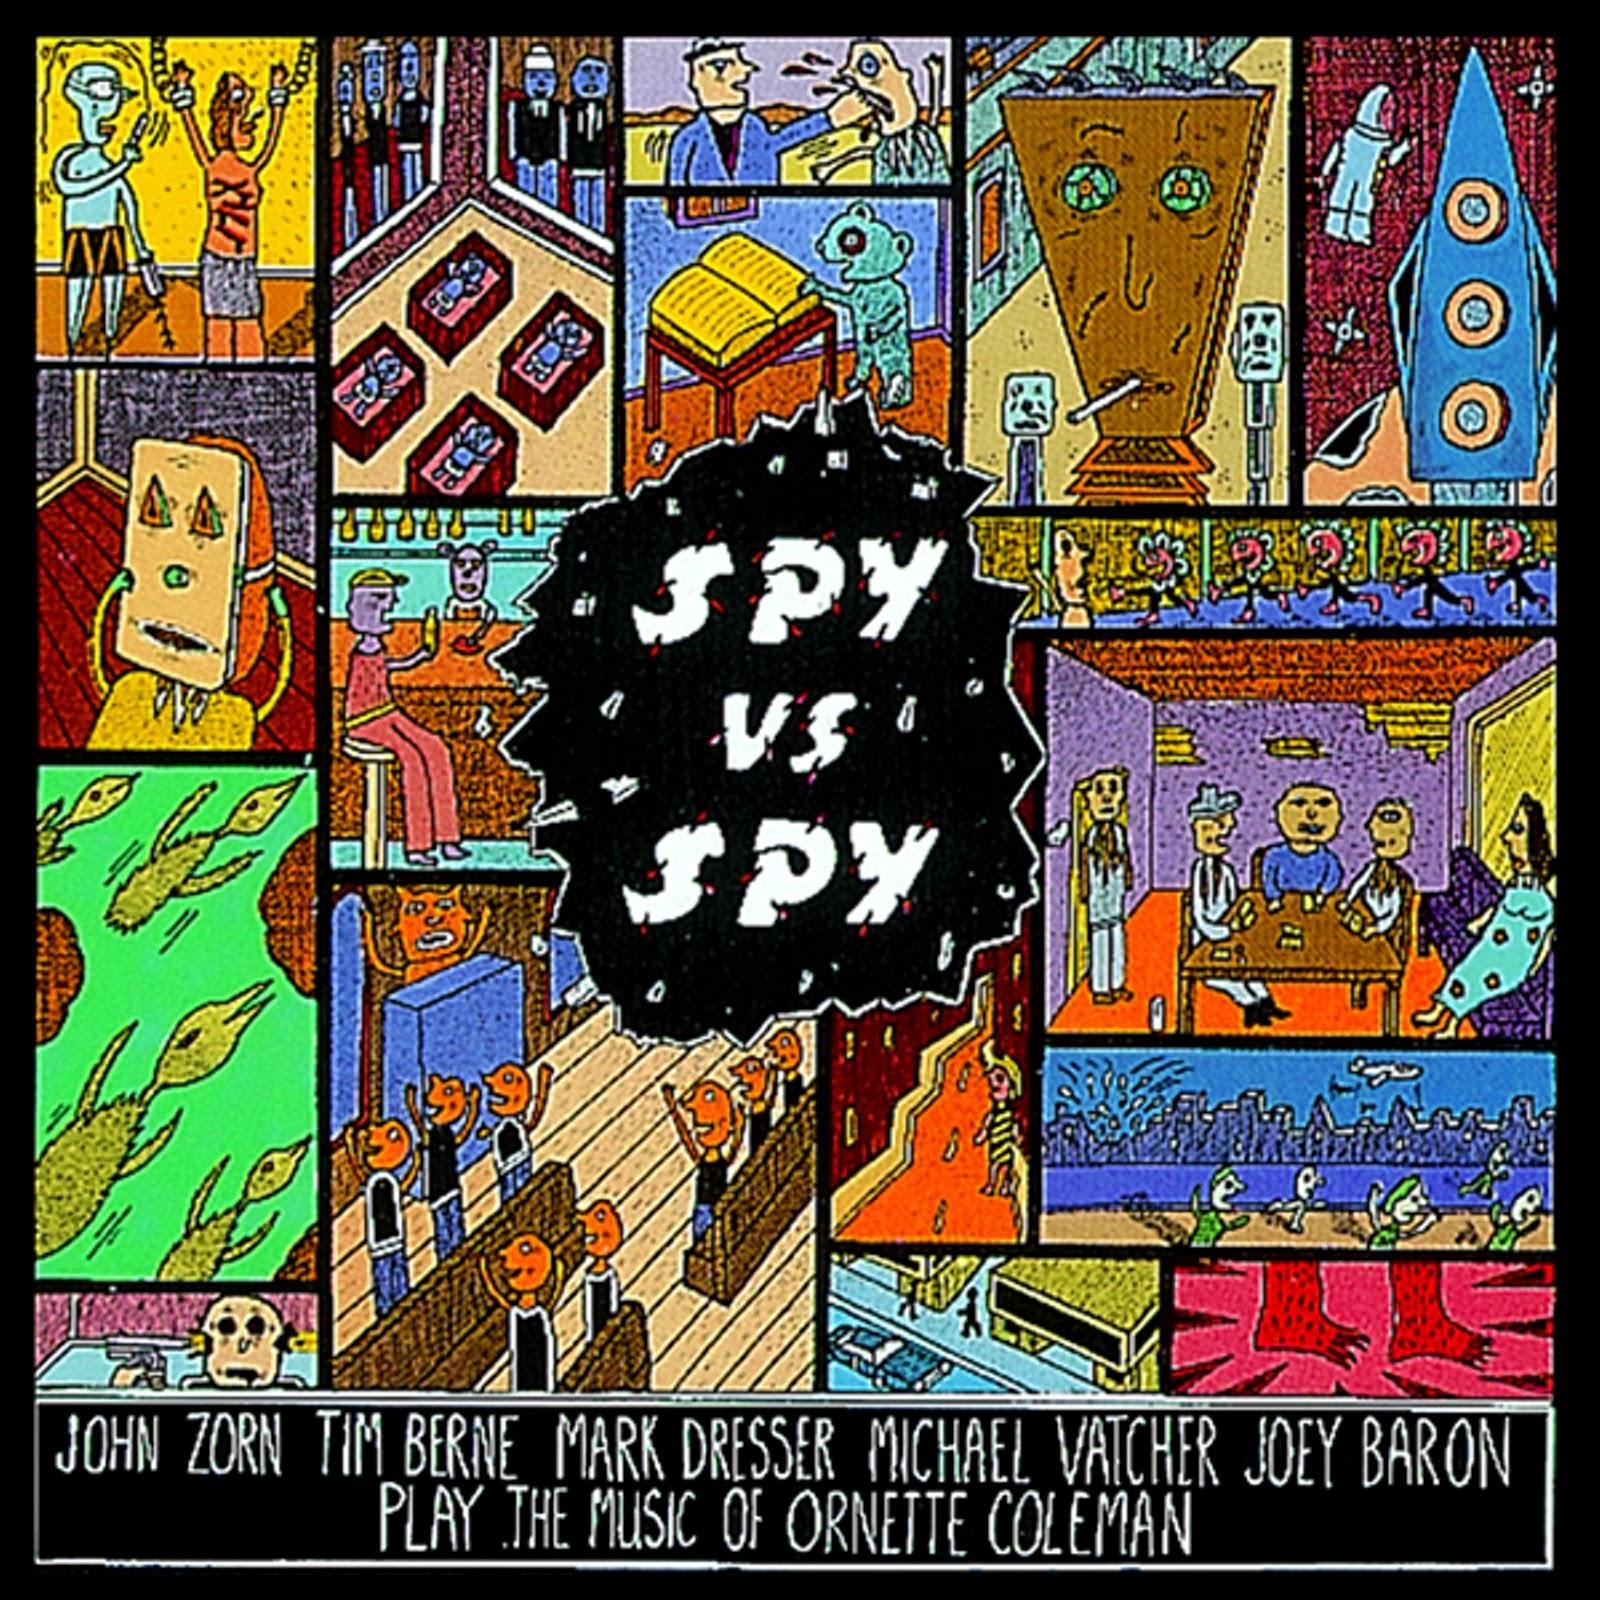 http://1.bp.blogspot.com/-MNQwyfcOamg/URHGmu-9wHI/AAAAAAAAGuY/R8nqvu7a4zY/s1600/%5BAllCDCovers%5D_john_zorn_spy_vs_spy_the_music_of_ornette_coleman_1999_retail_cd-front.jpg